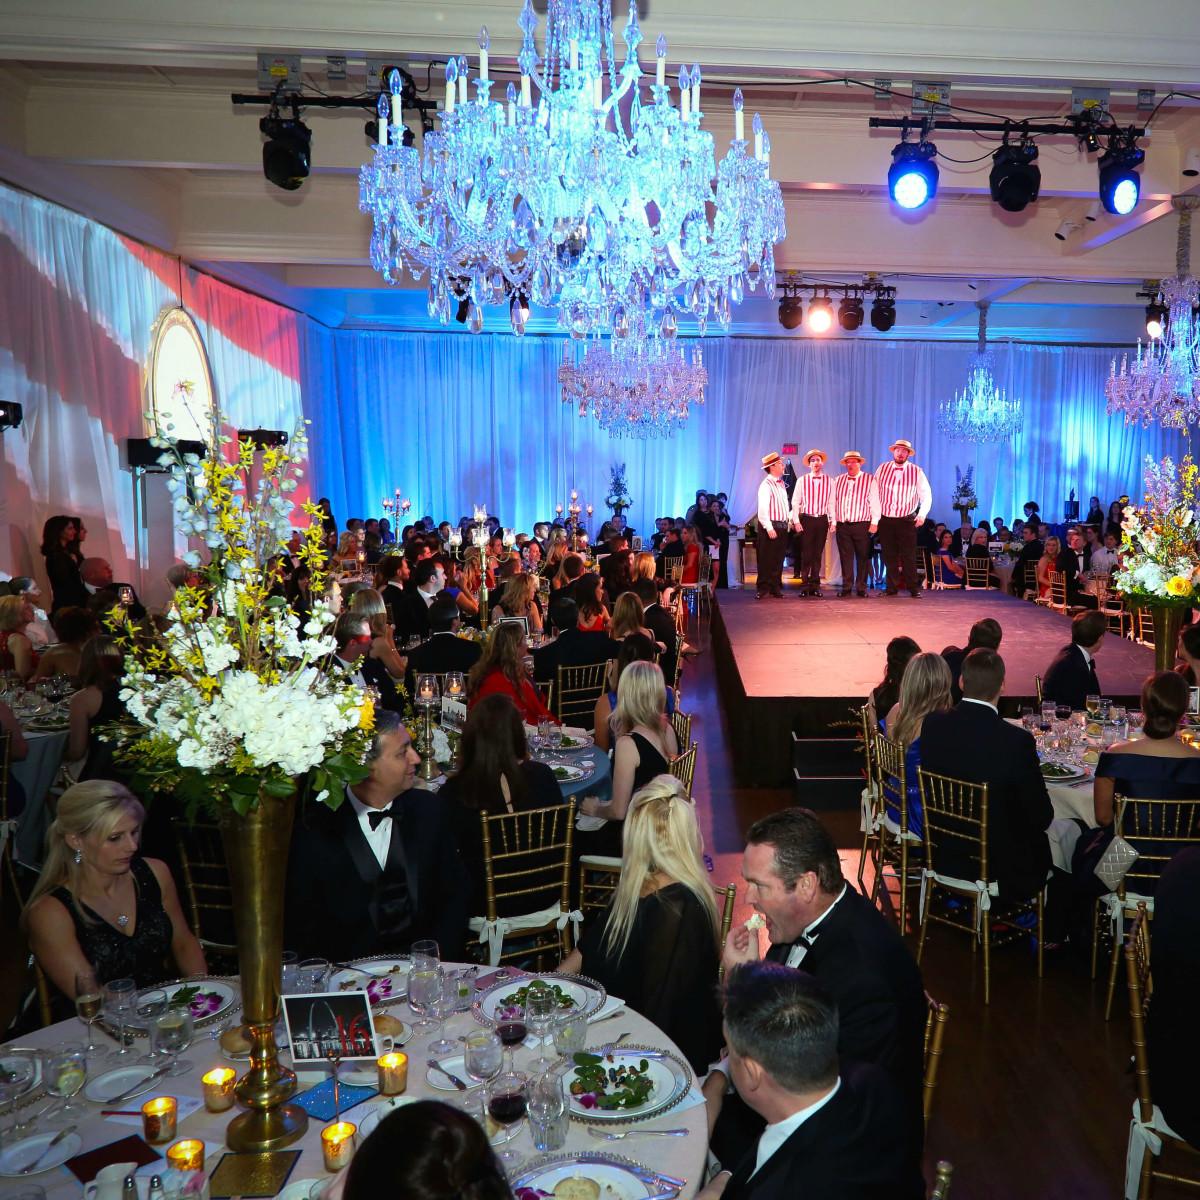 Houston, Junior League of Houston Charity Ball, Feb 2017, ballroom